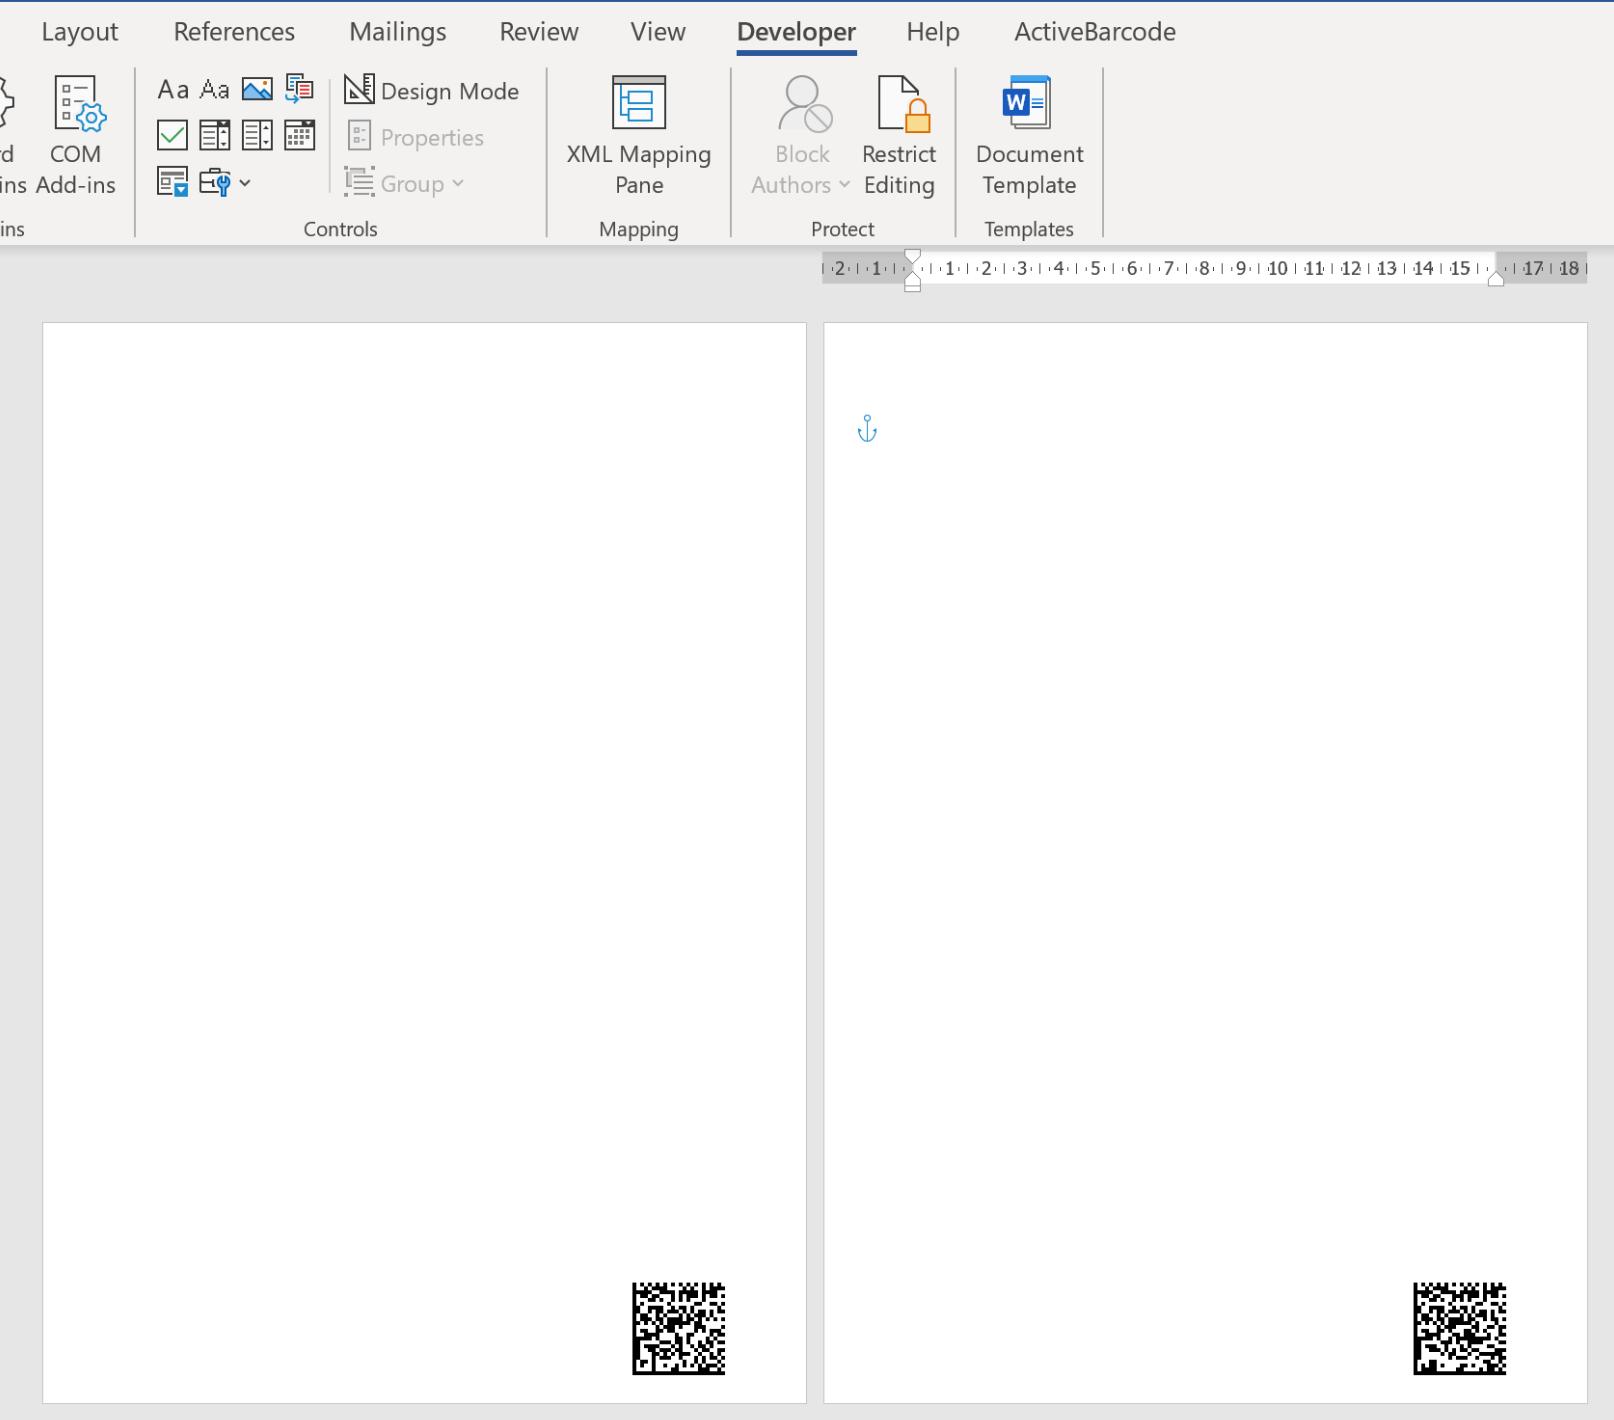 Screenshot 2020-03-26 16 56 55